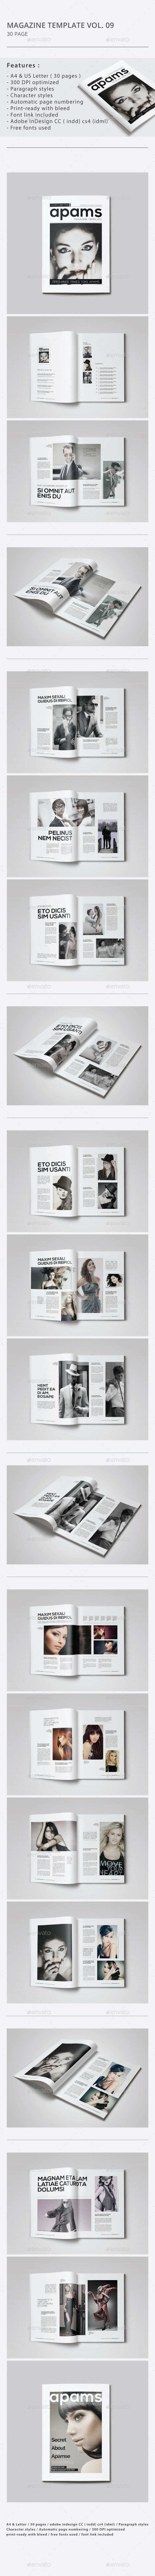 GraphicRiver Indesign Magazine Template Vol.09 9498512